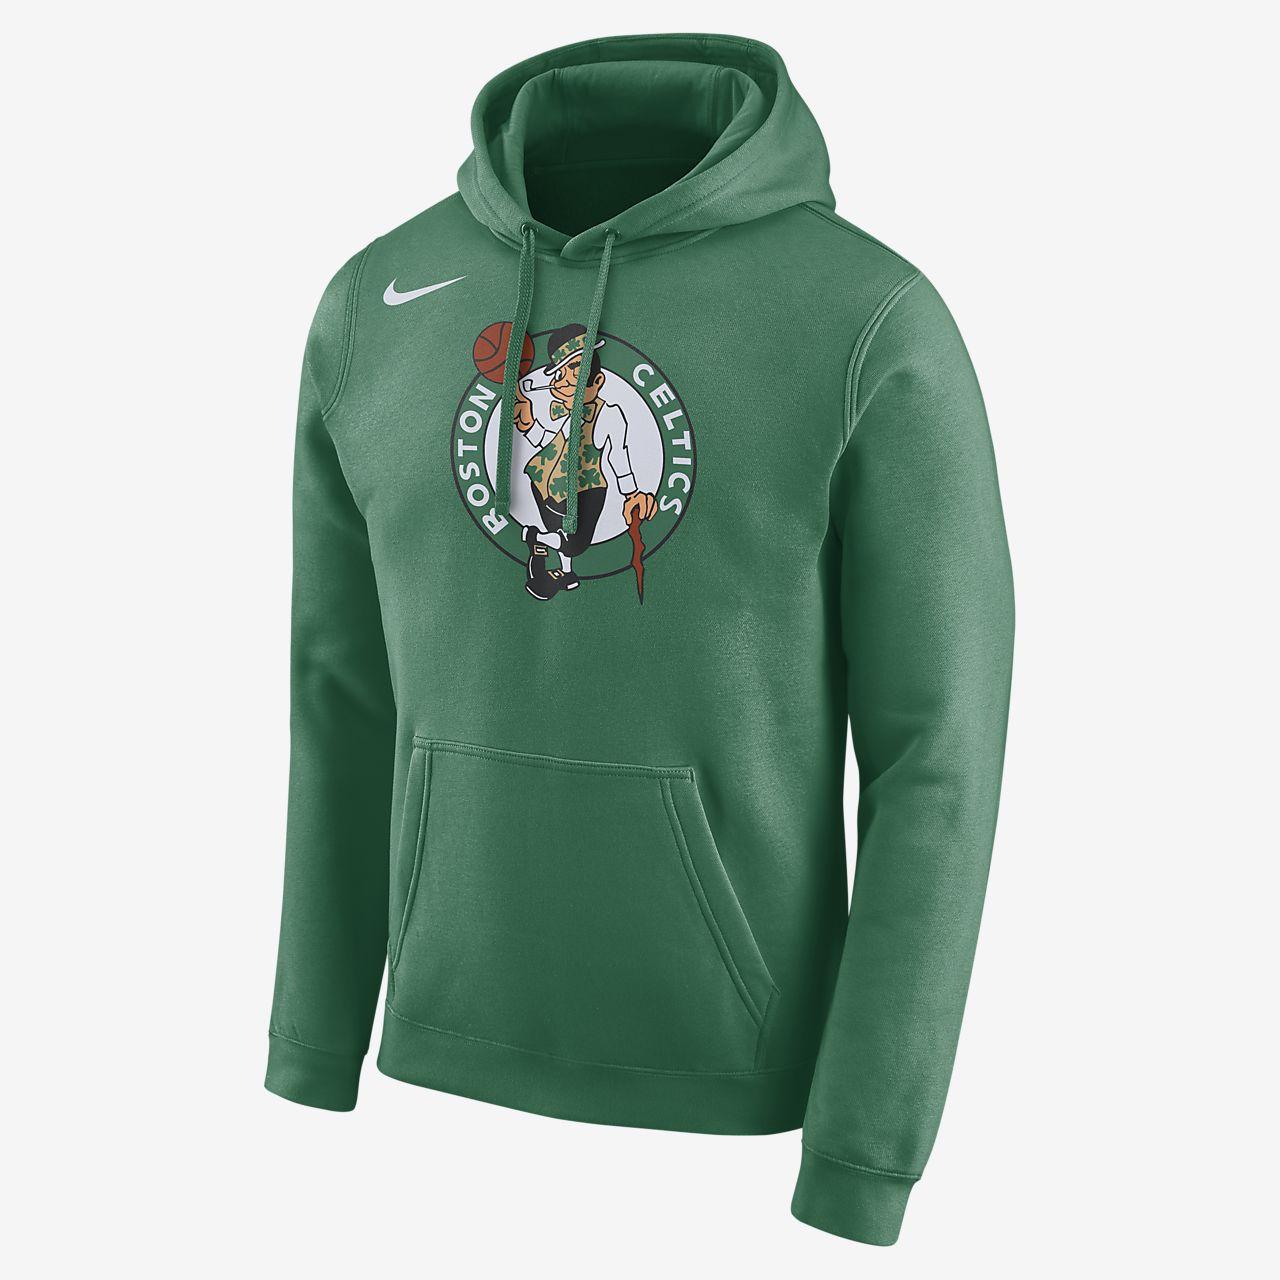 super popular 62a09 ee0c3 Boston Celtics Nike Men's Logo NBA Hoodie